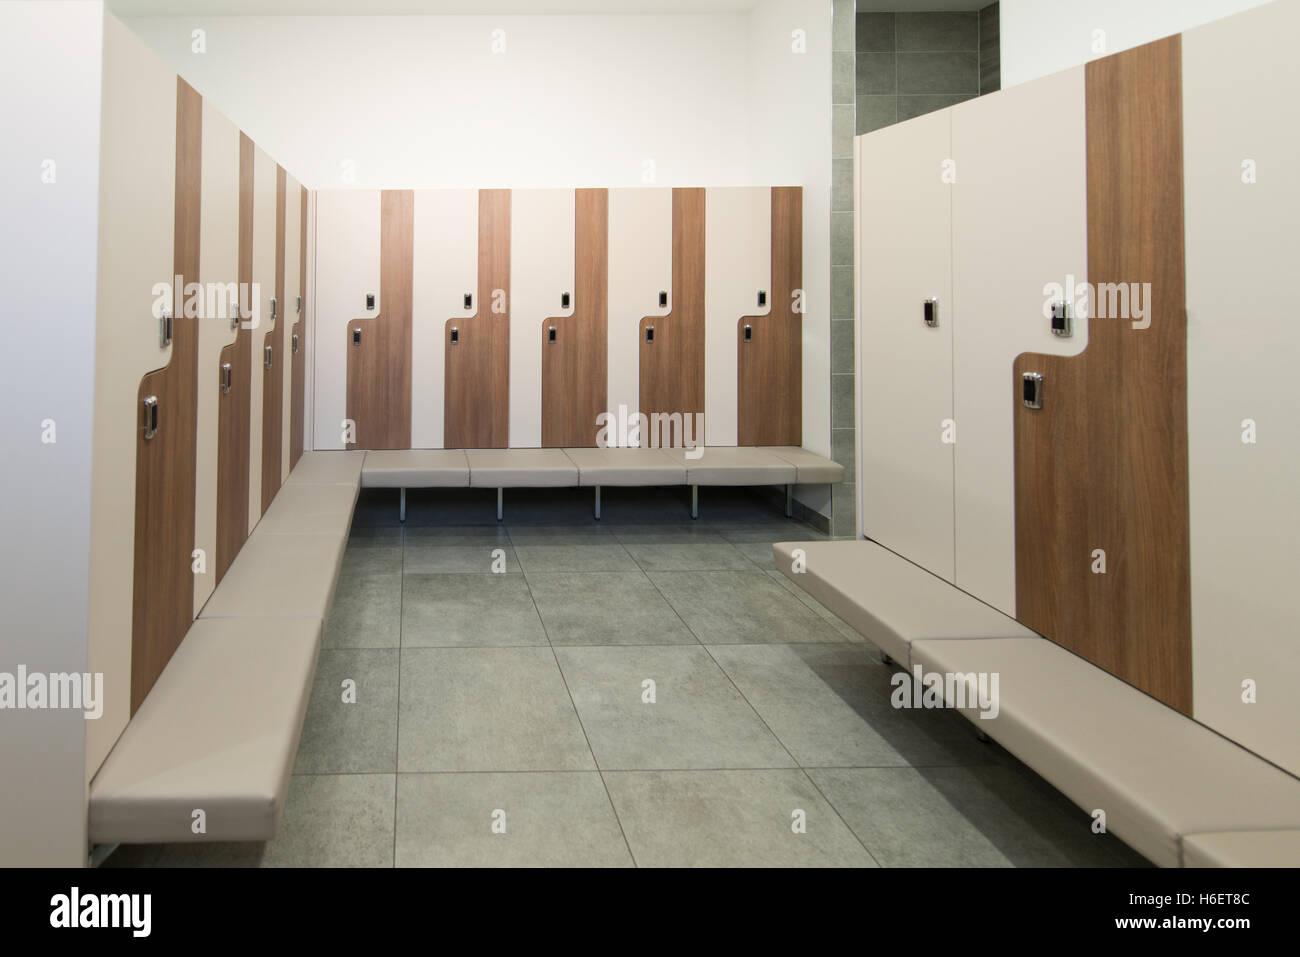 Modernes Interieur des Schrankes Umkleide im Fitness-Center Fitness ...